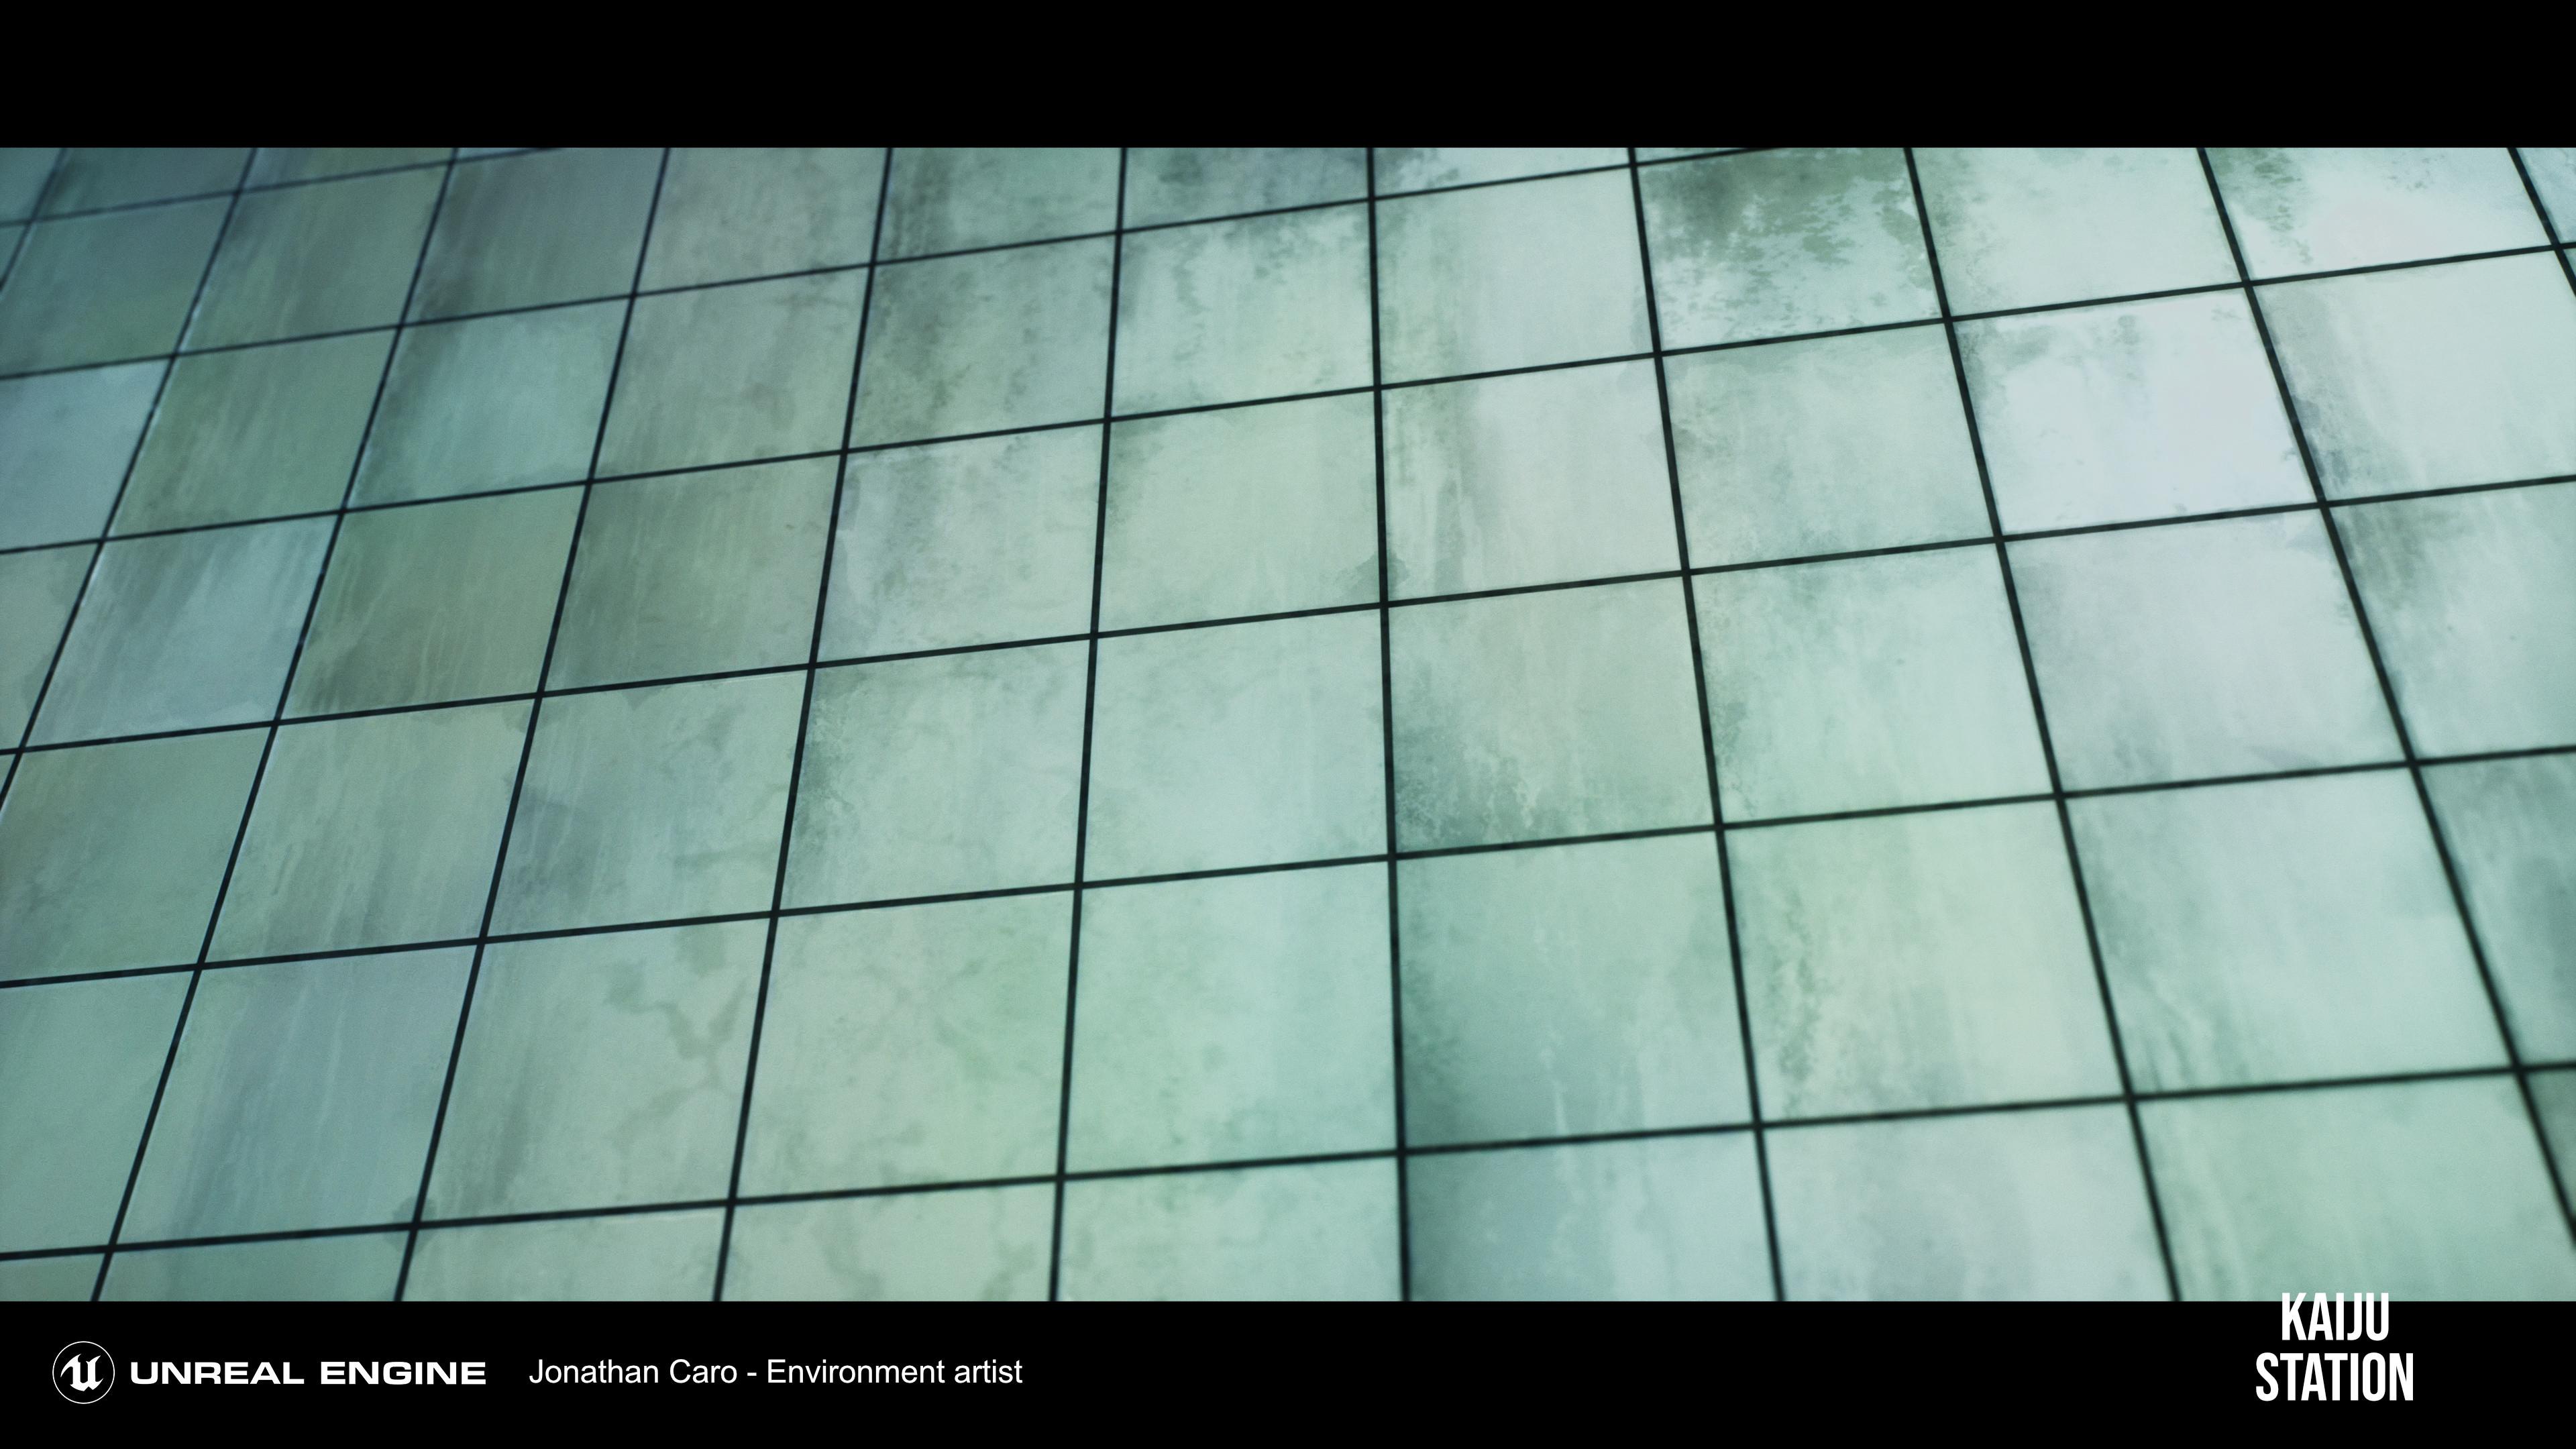 platform wall tiles created with substance designer